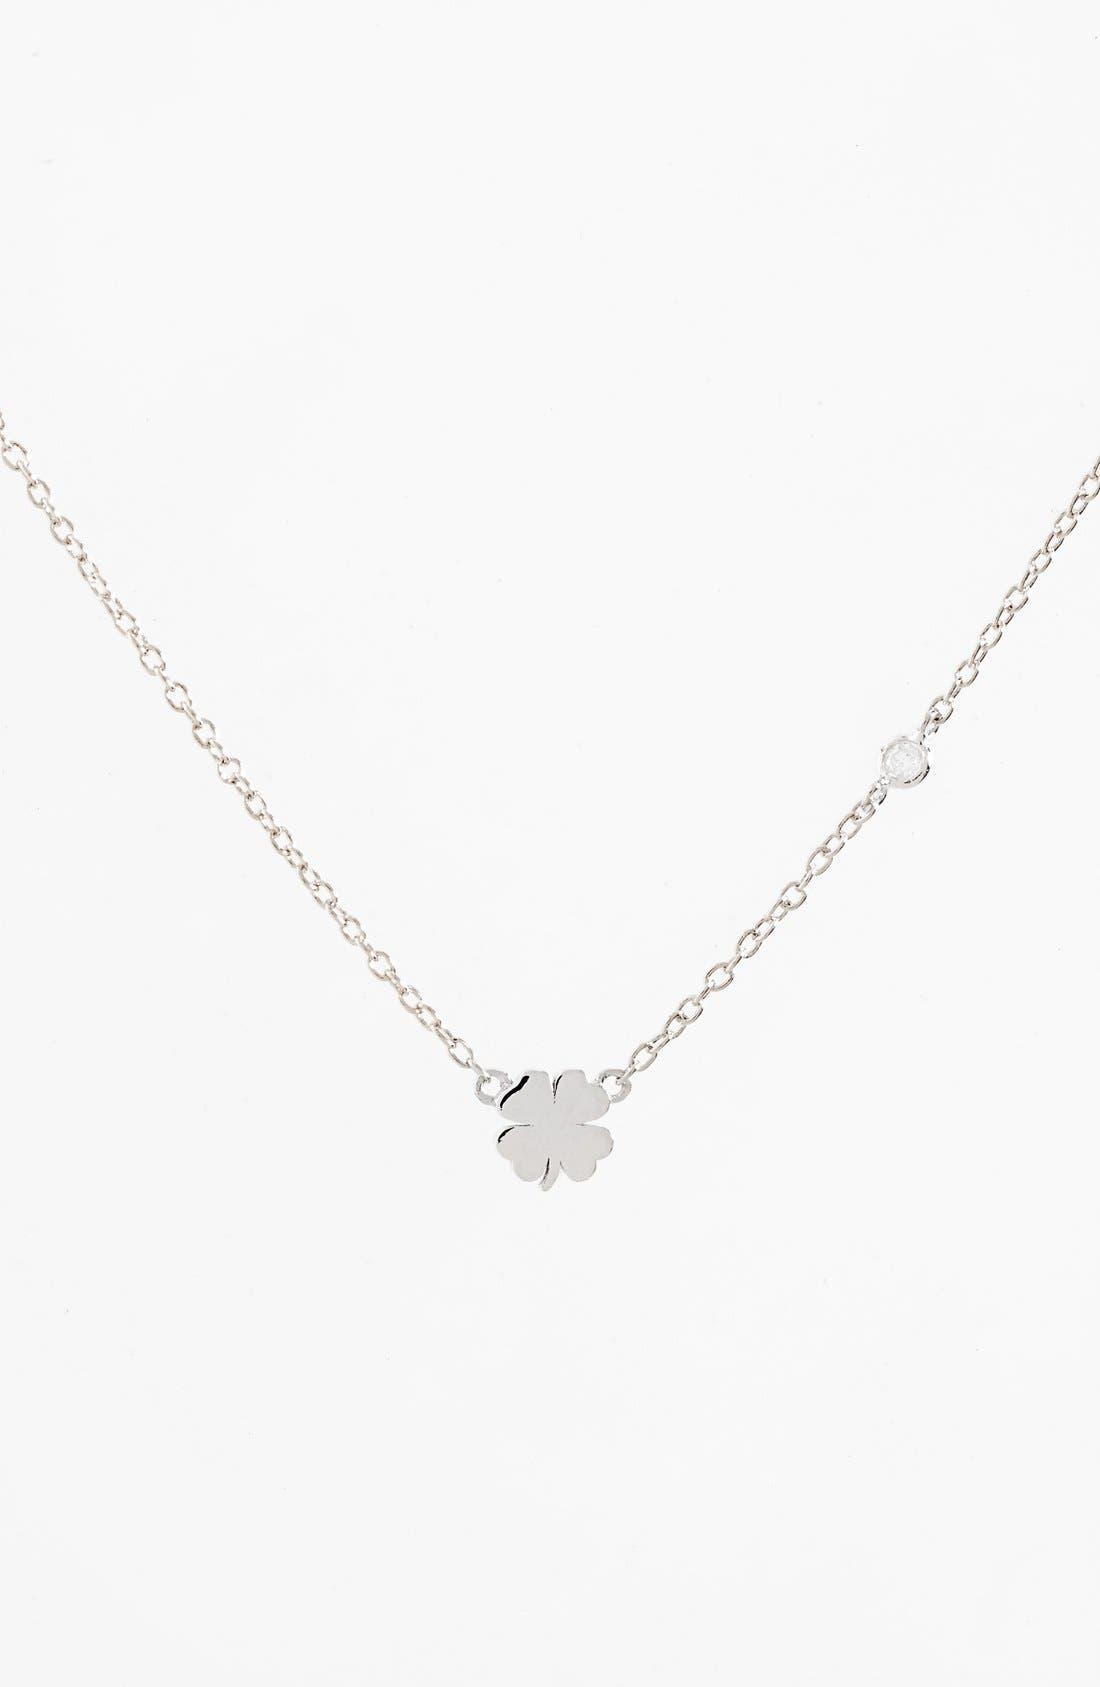 Clover Necklace,                             Main thumbnail 1, color,                             Silver